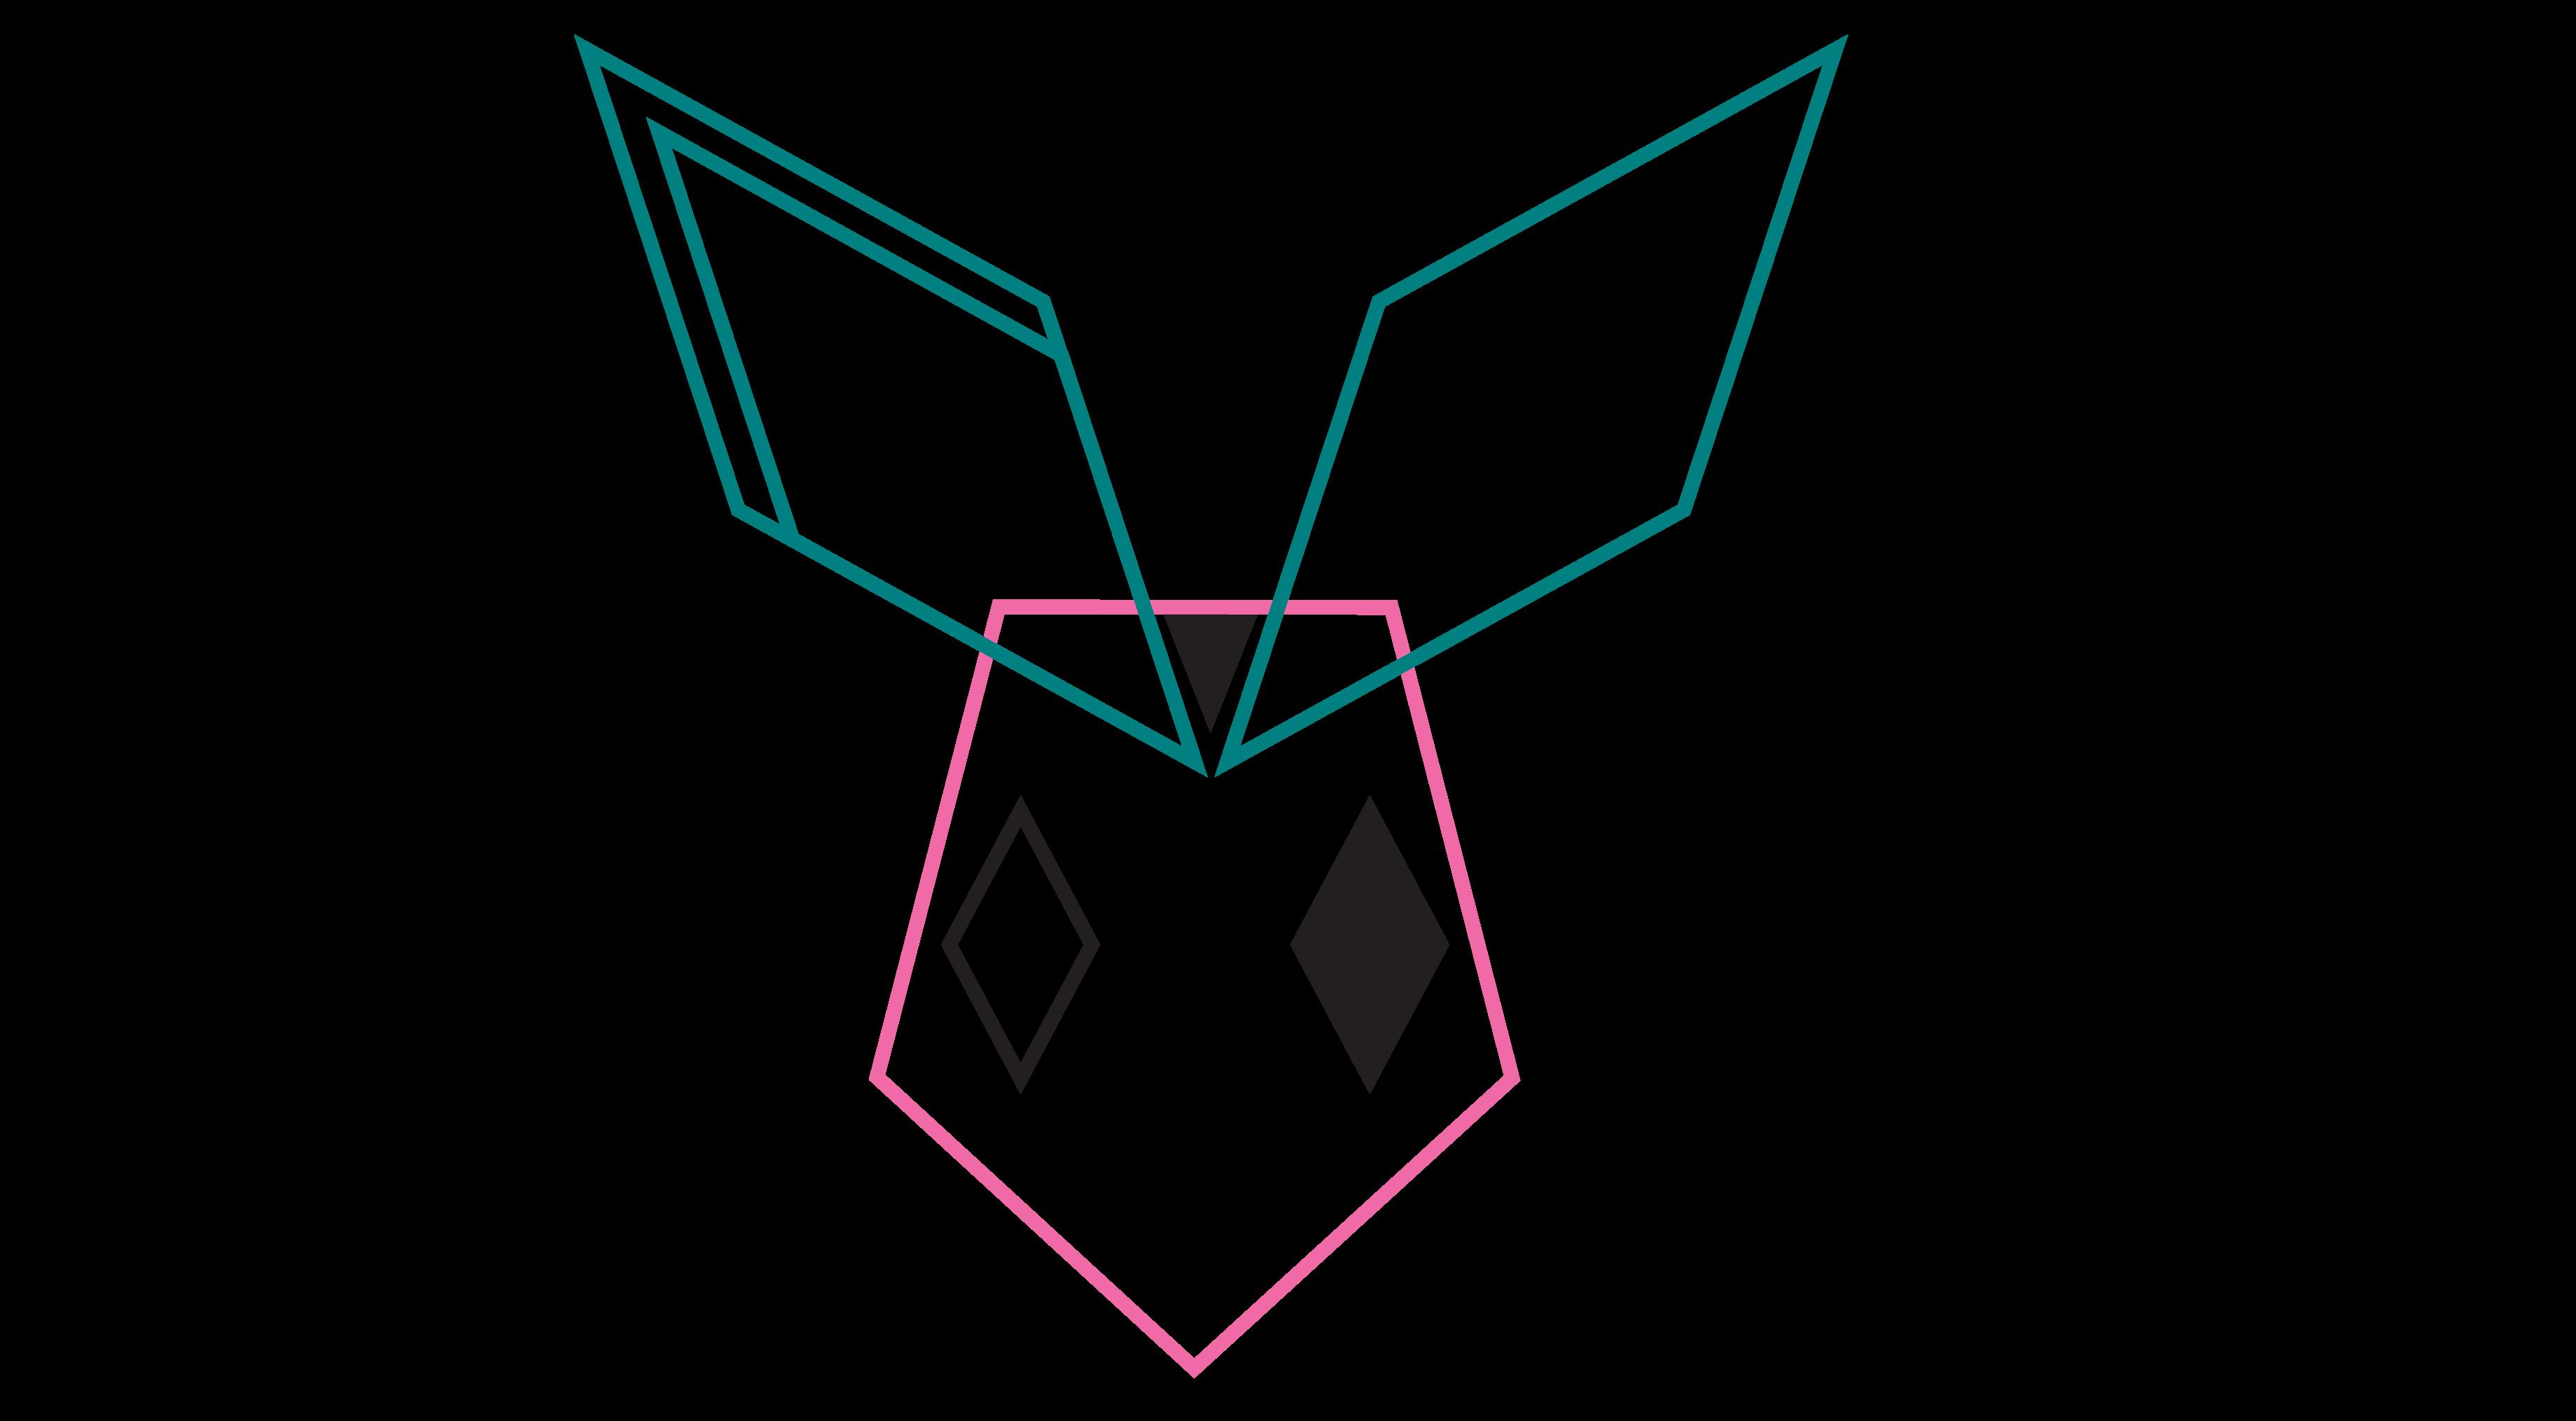 Onyx Bunny